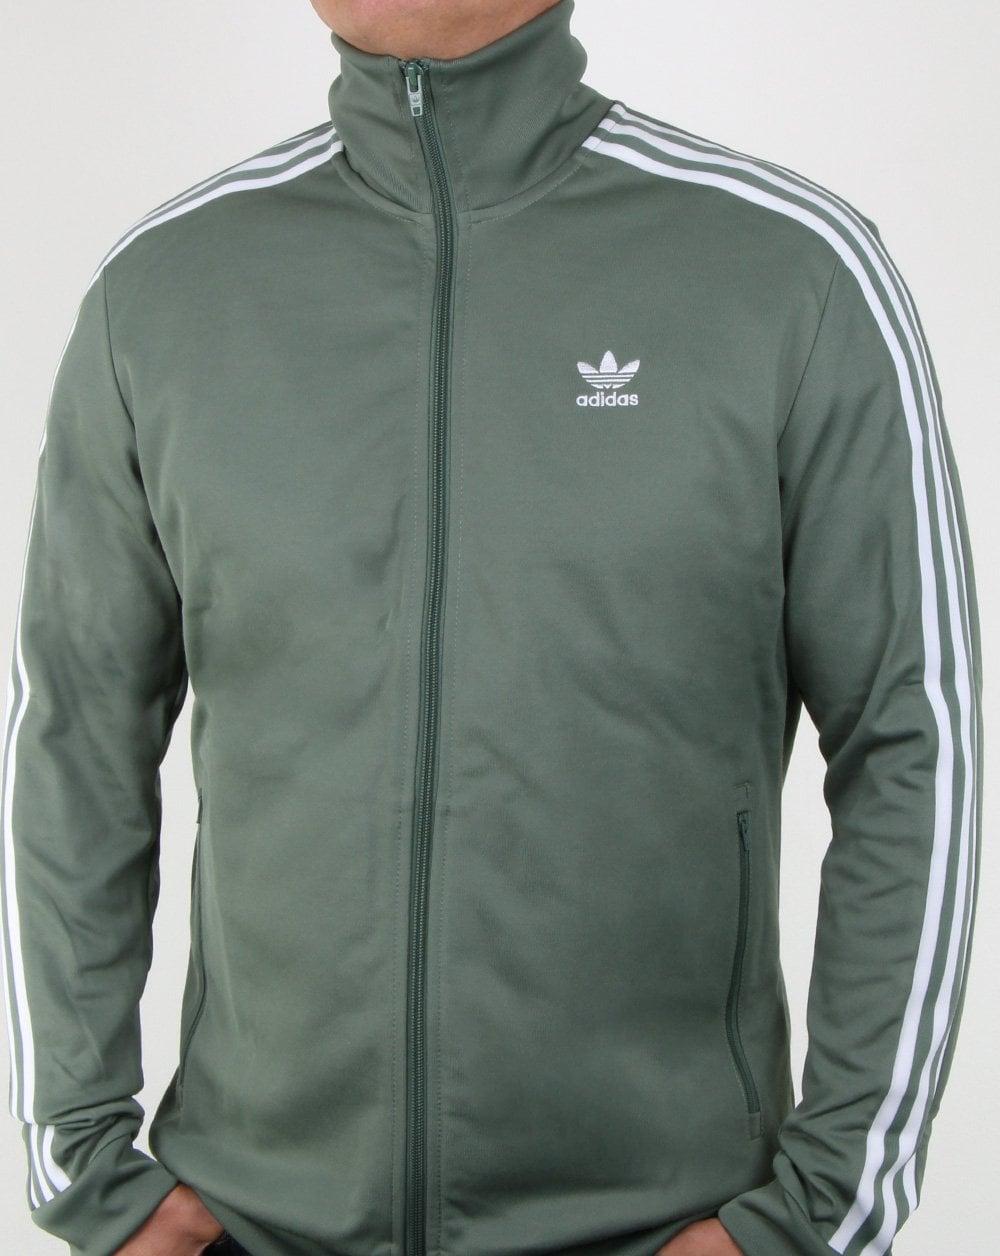 Adidas Beckenbauer Tracktop Originals Jacke Jacke Jacke